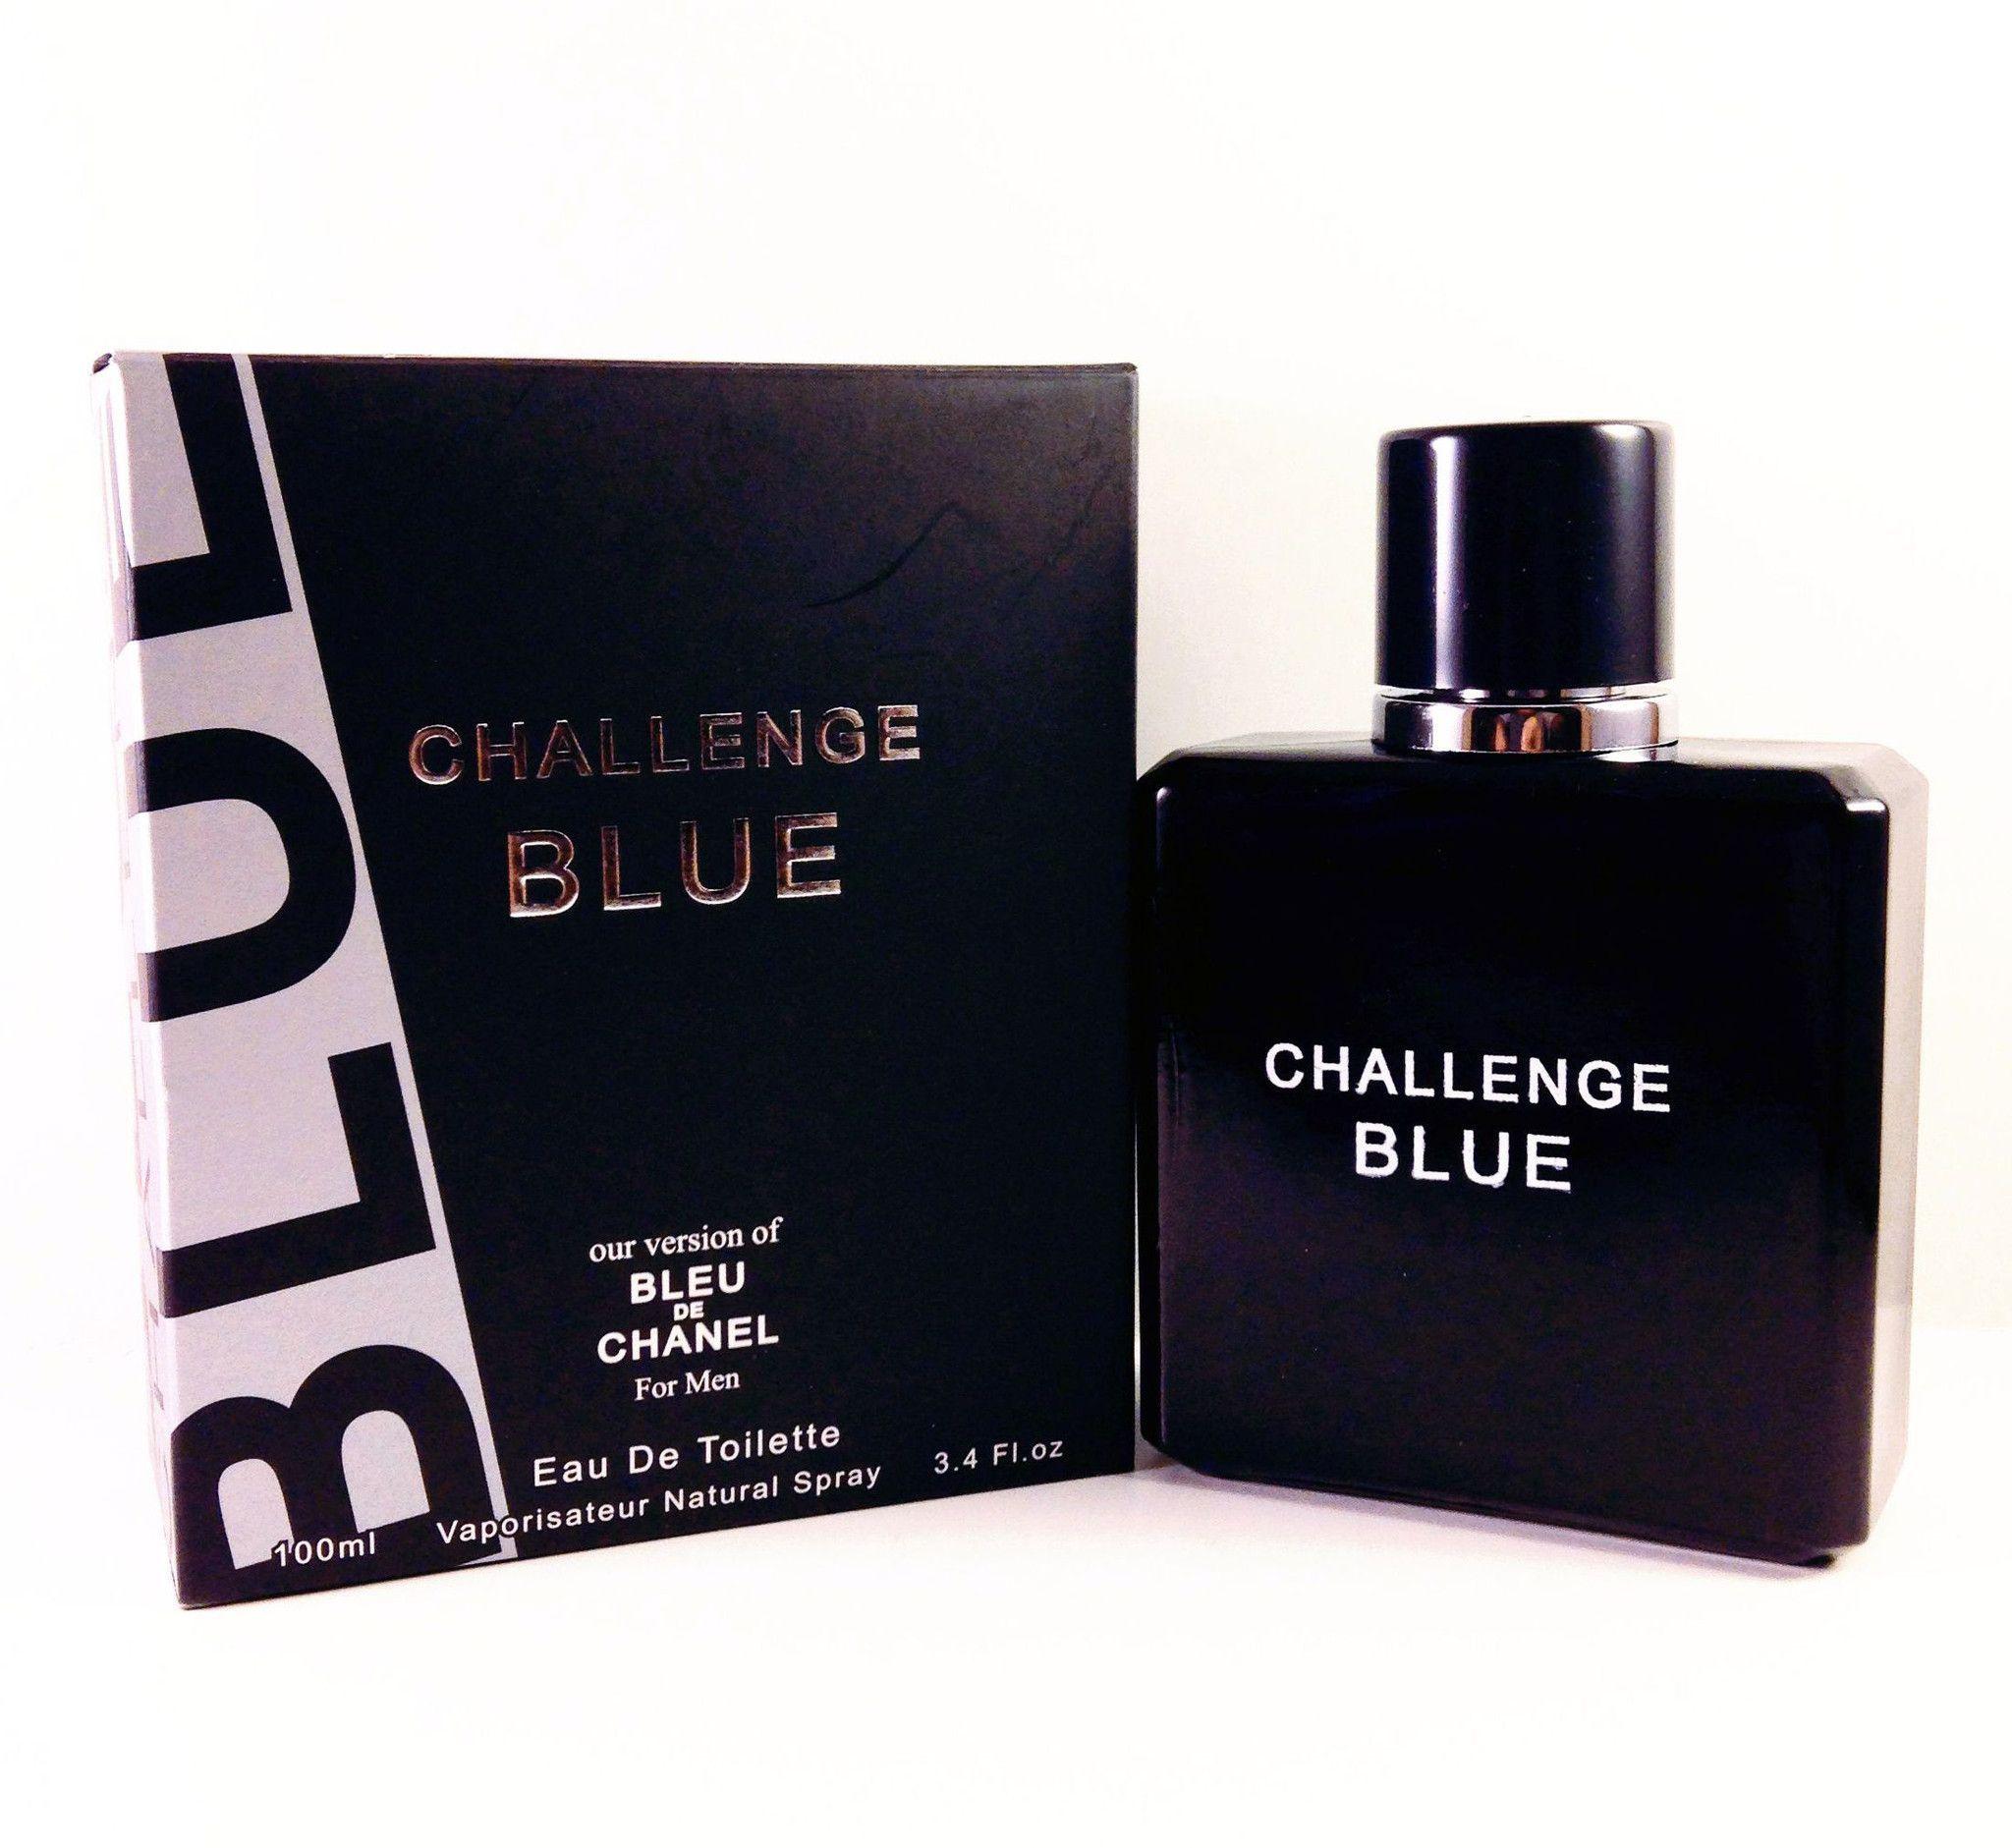 CHALLENGE BLUE